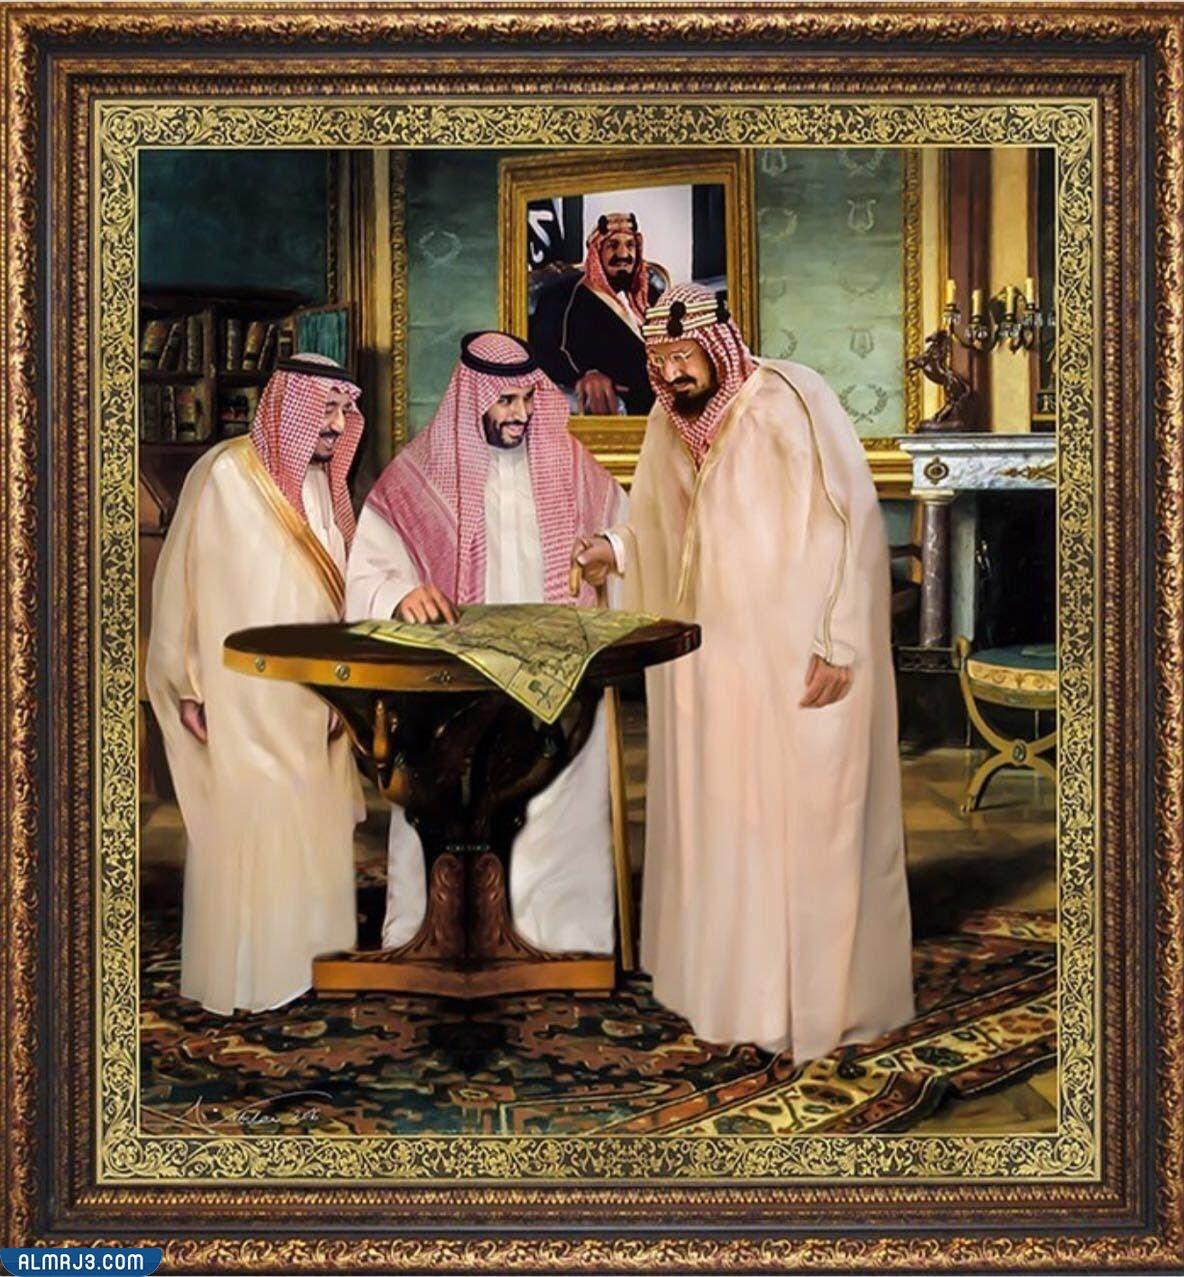 صو تصميم الملك سلمان ومحمد بن سلمان